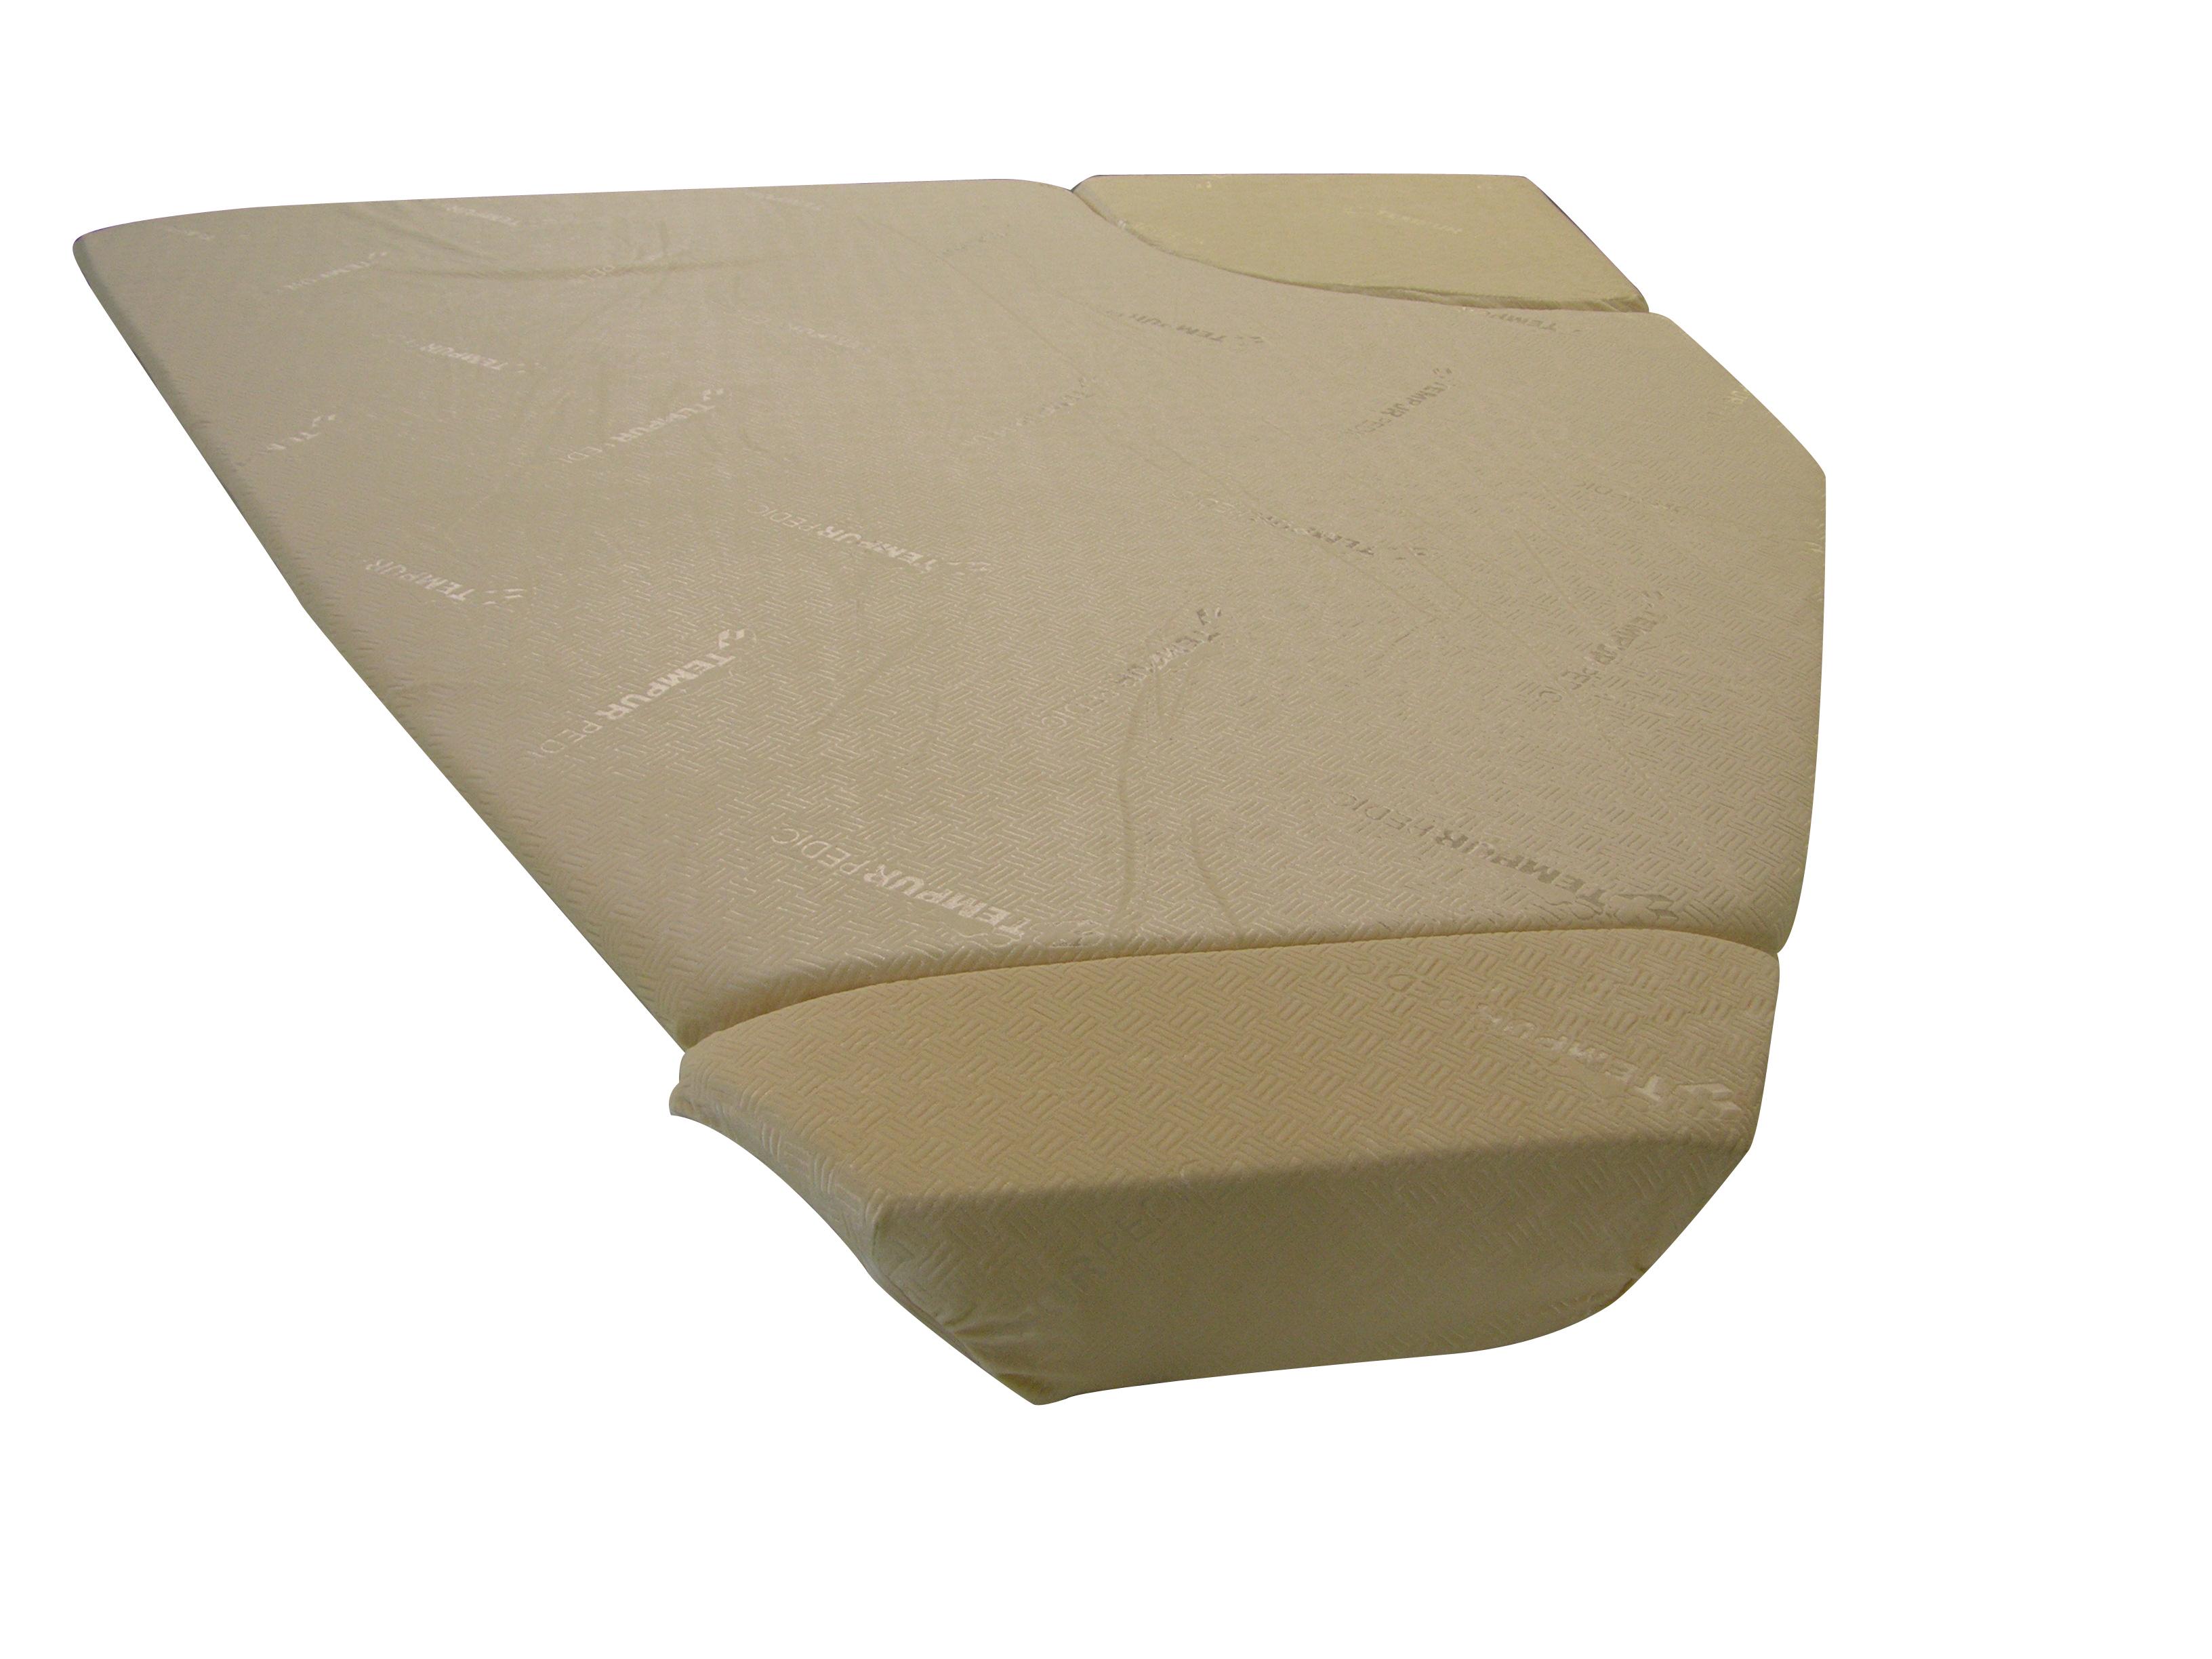 3 peice complex mattress